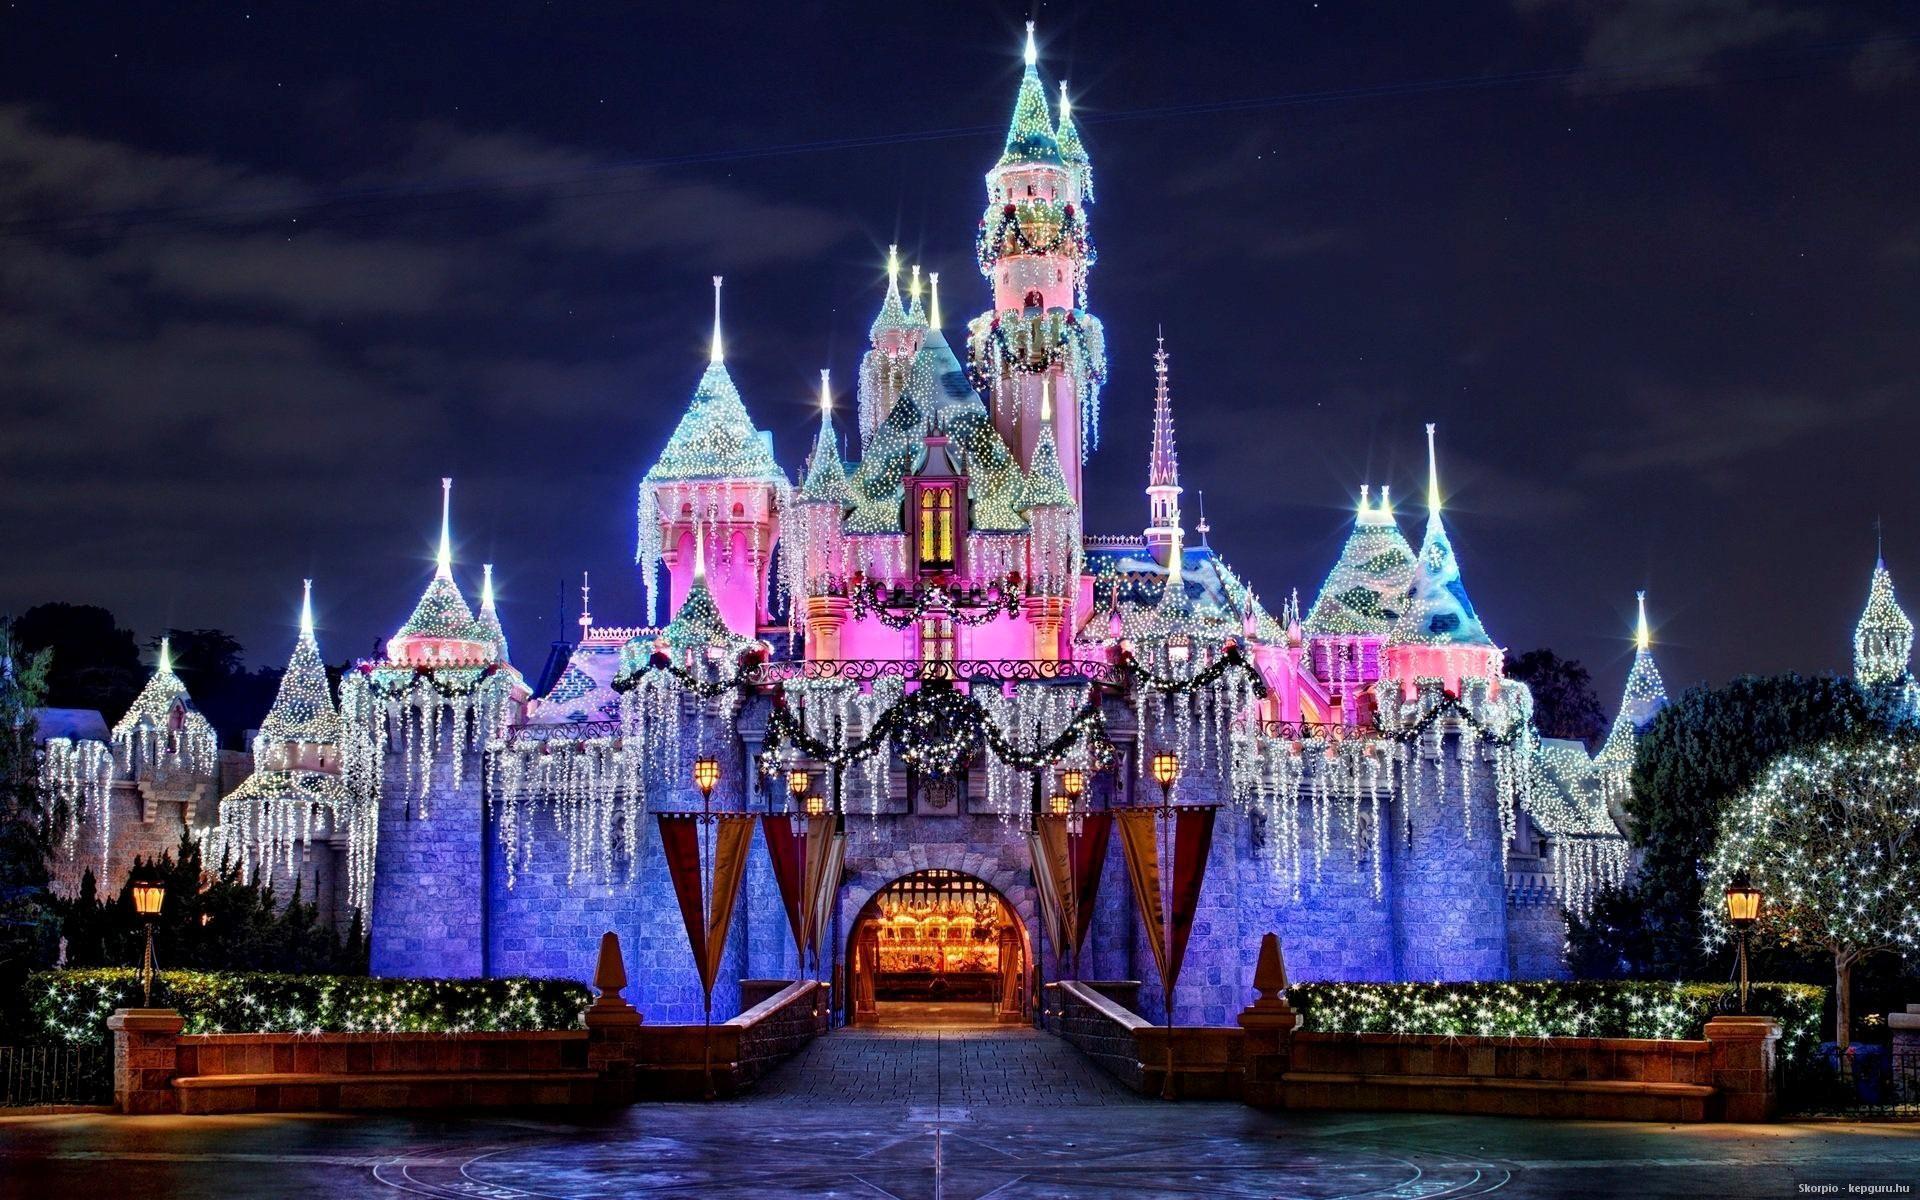 Disneyland California Wallpapers Top Free Disneyland